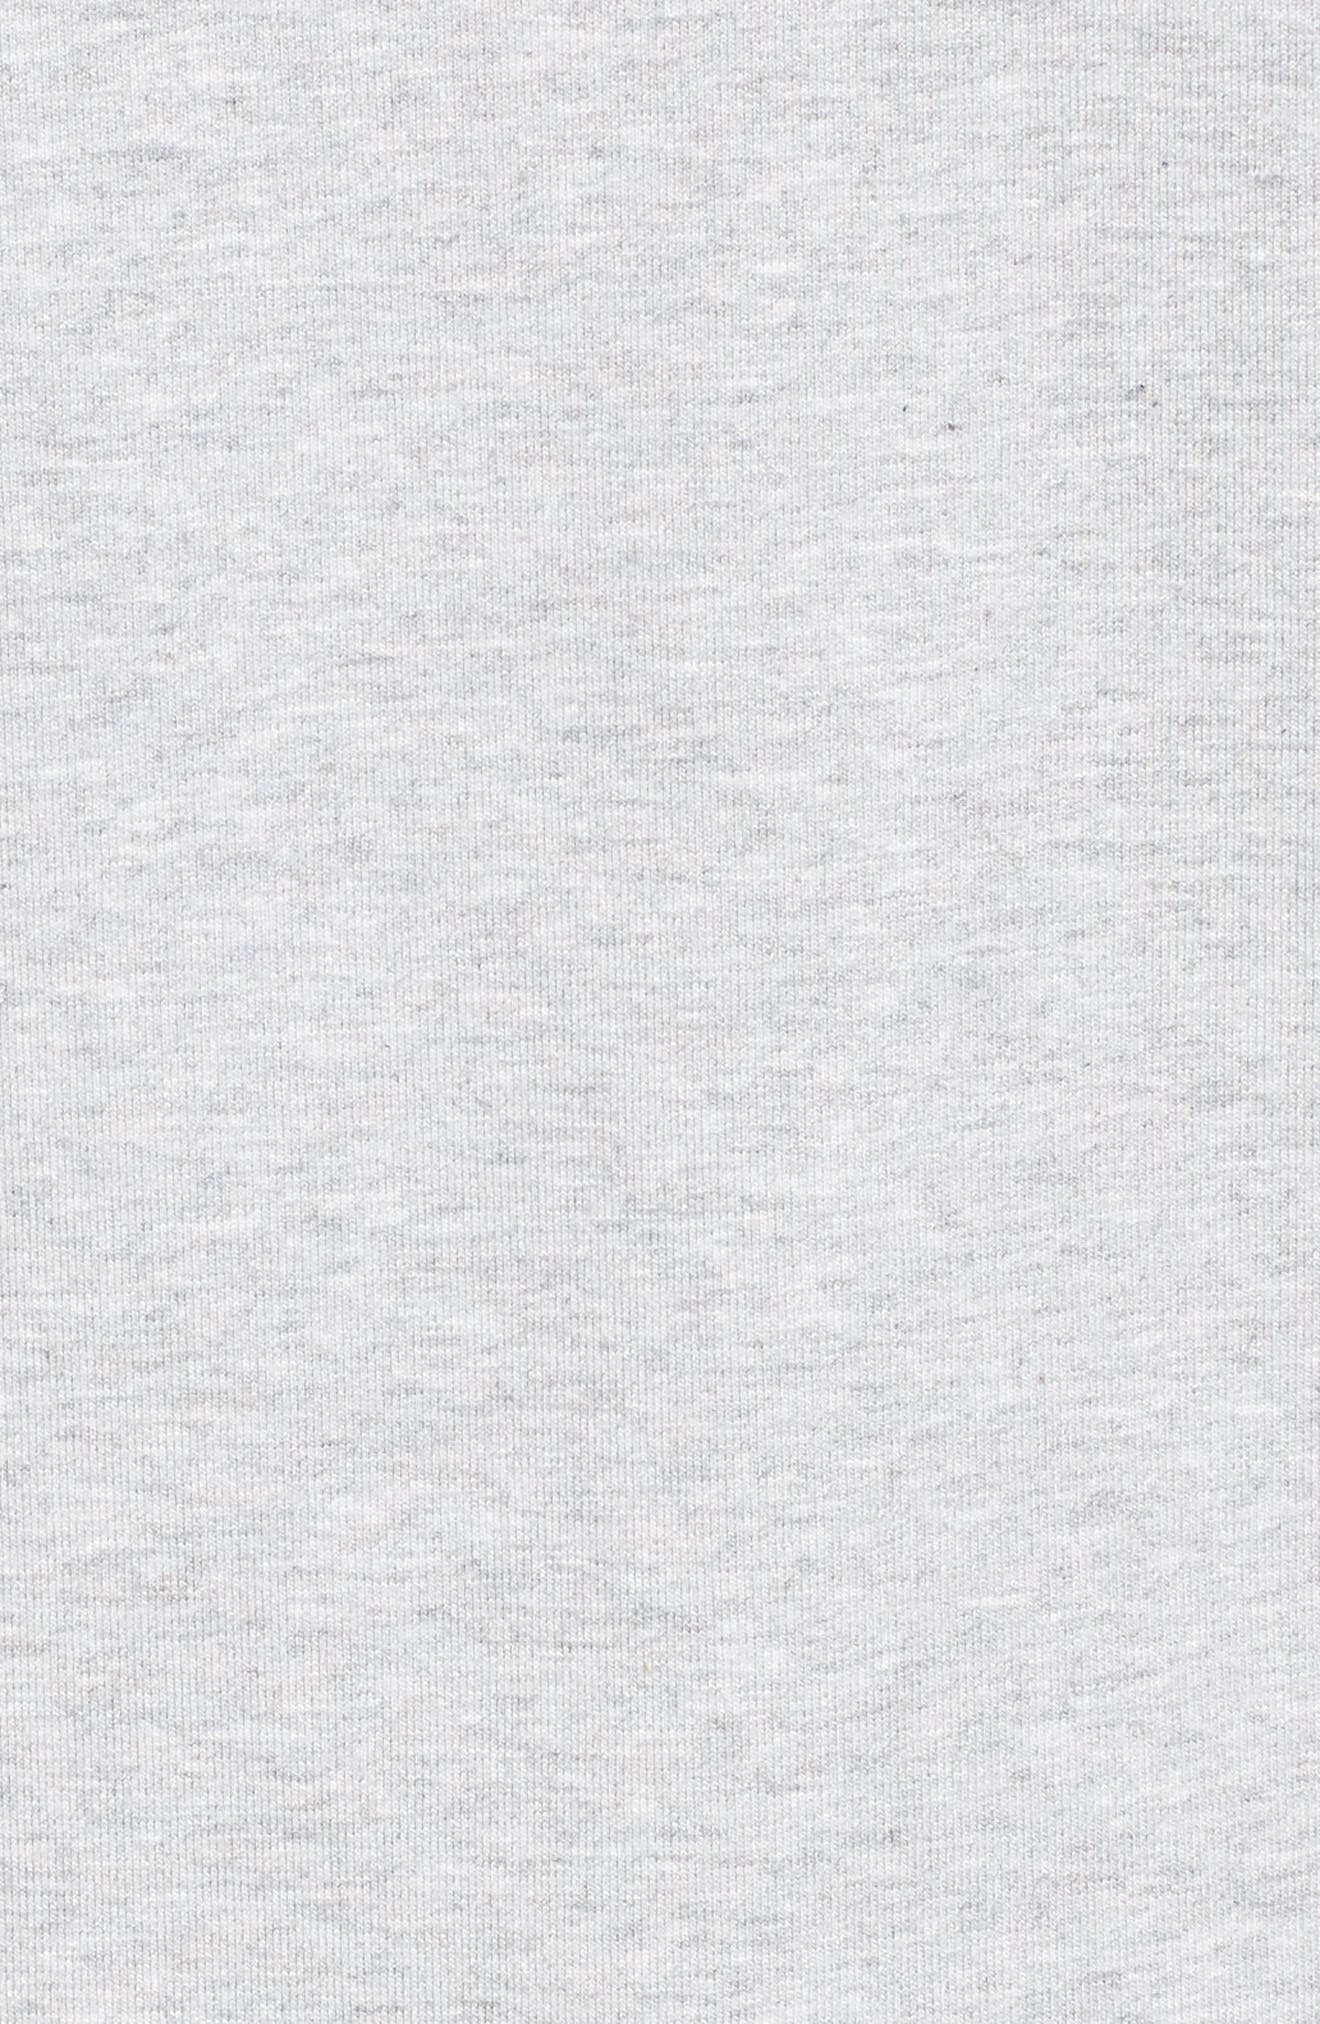 Embellished Sweatshirt,                             Alternate thumbnail 6, color,                             Grey Heather